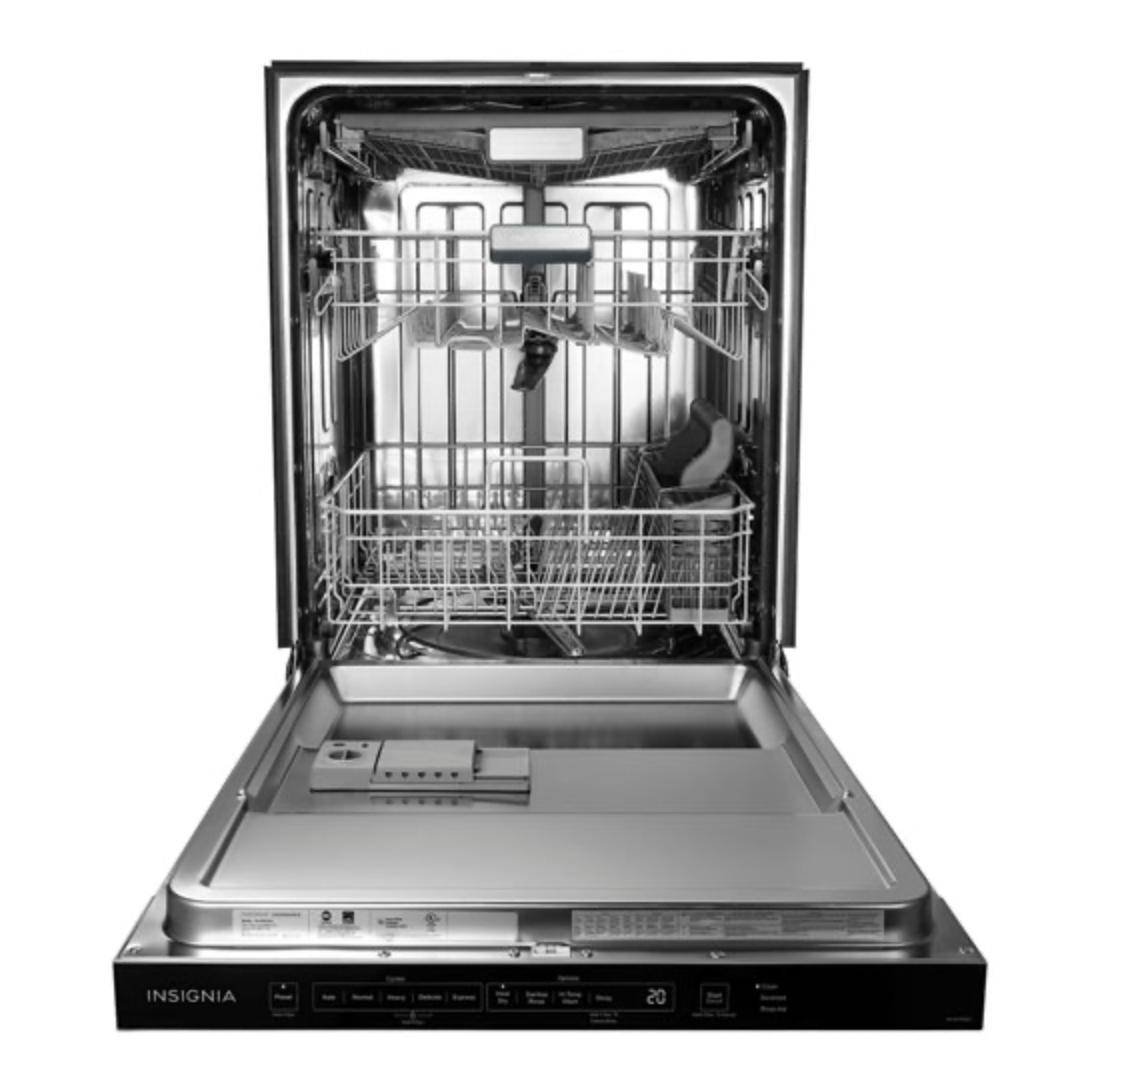 Insignia 24-inch dishwasher open empty.